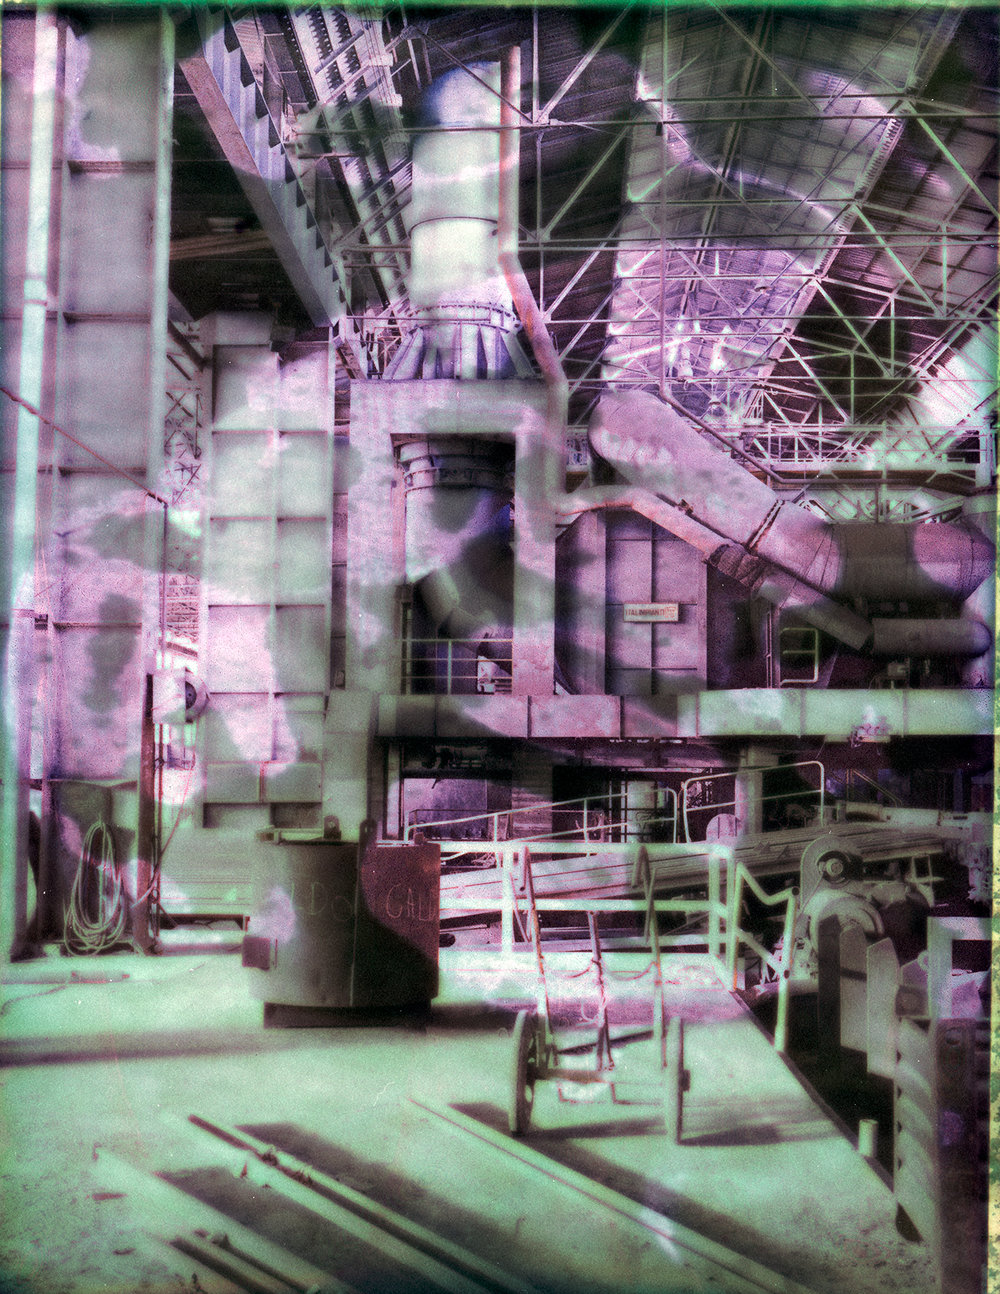 The Factory | Chamonix 4x5 | Fuji FP100C45 | Davide Maria Ferrari